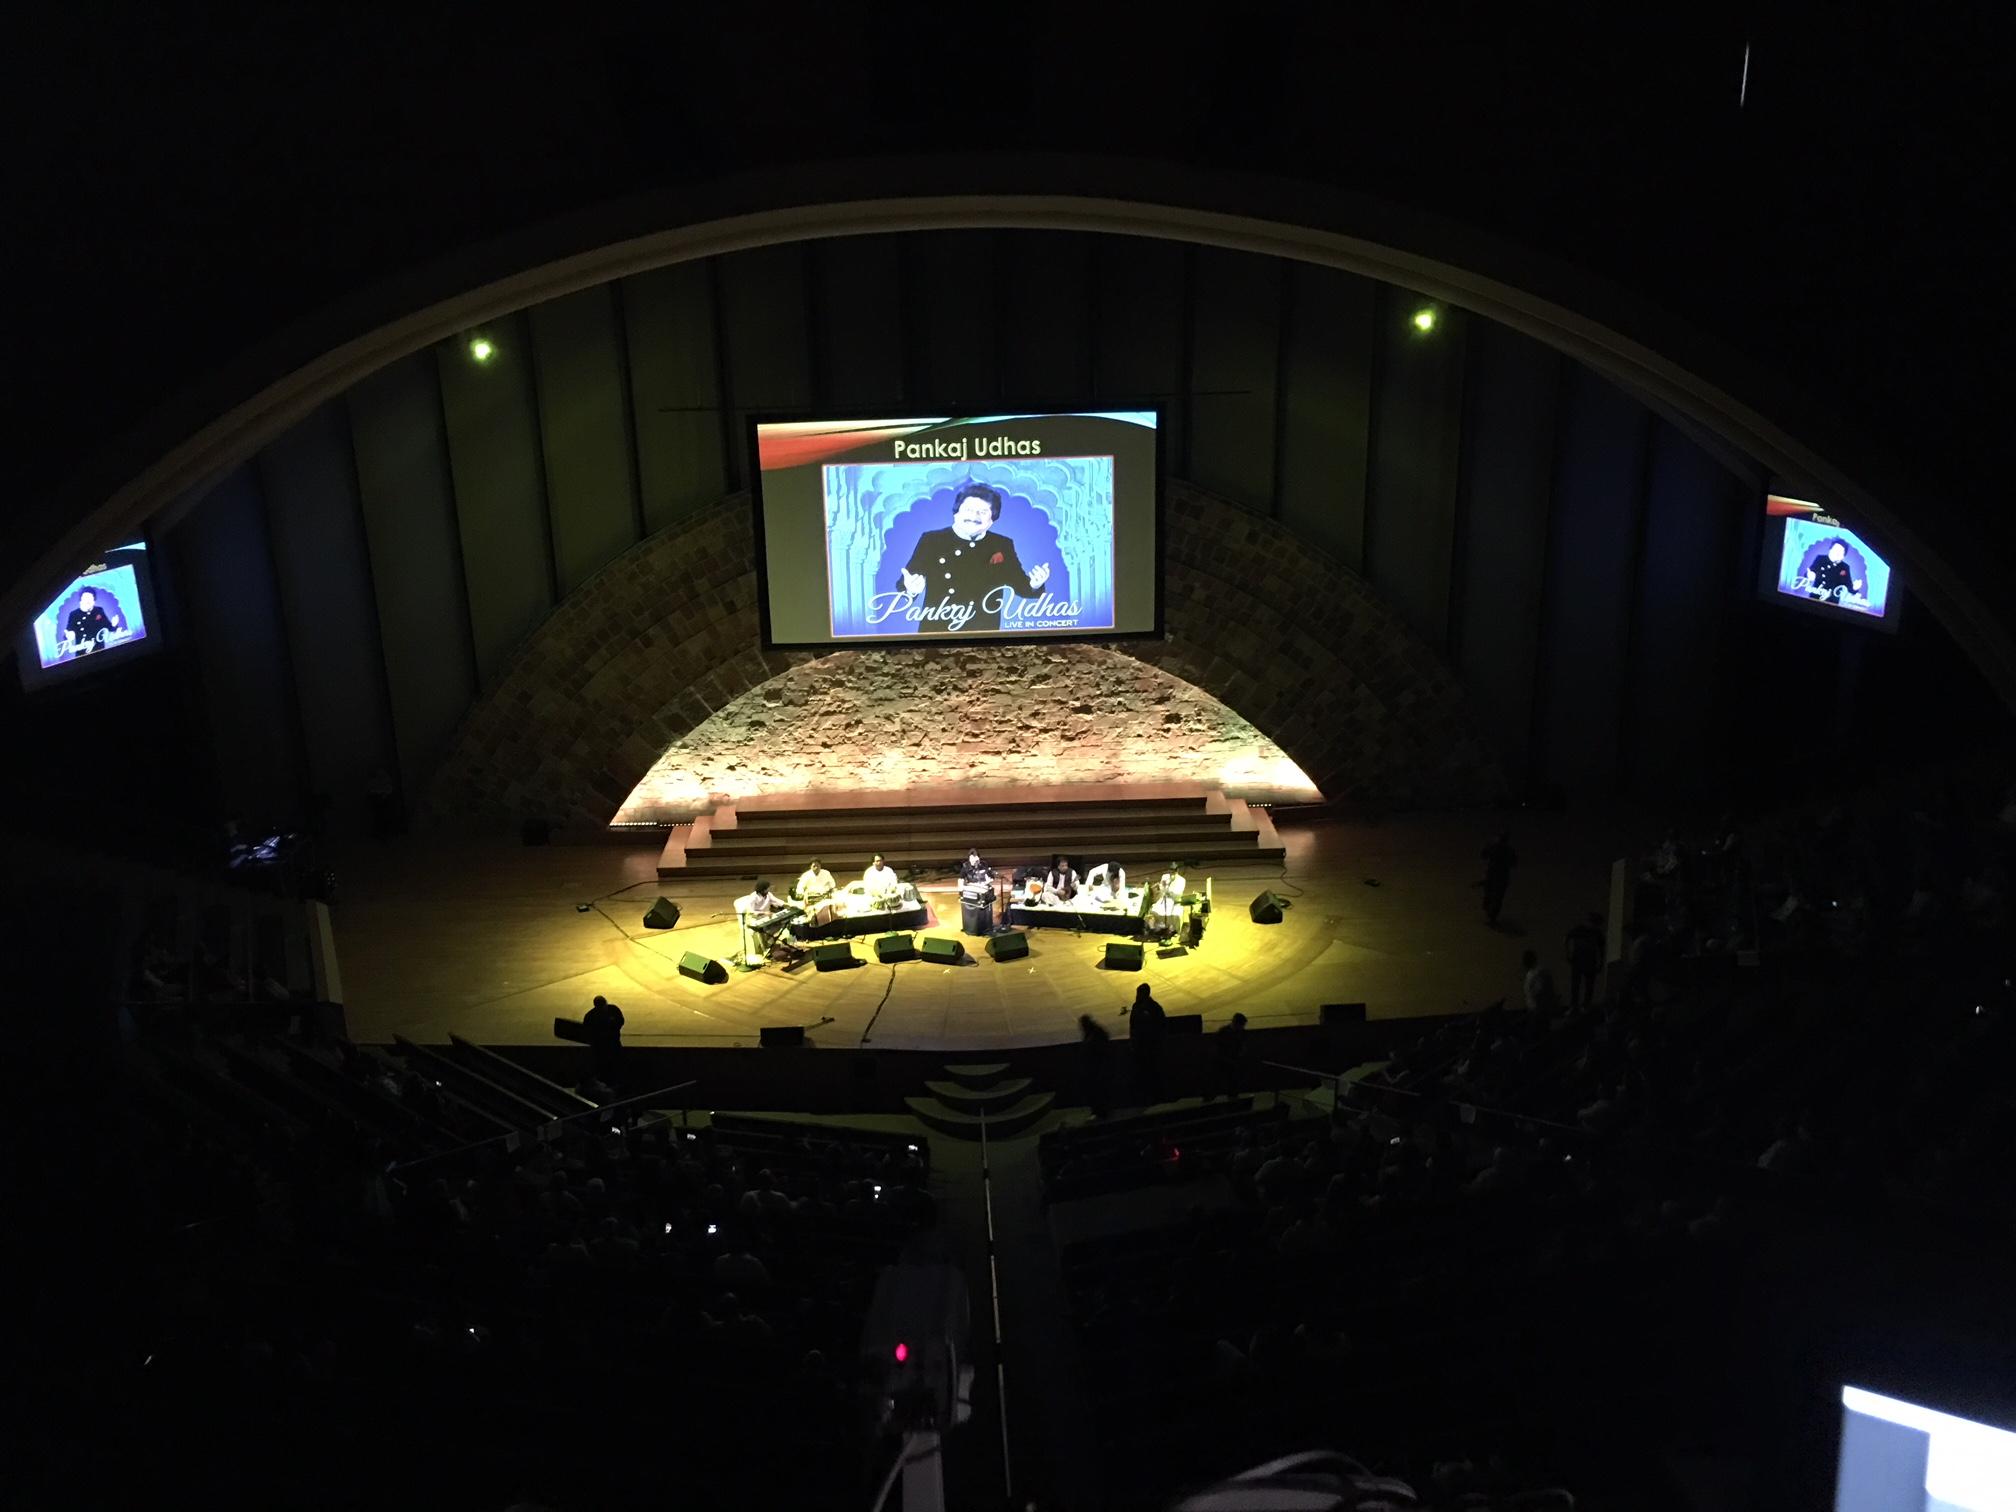 BBP_Concert 03.10.18.JPG